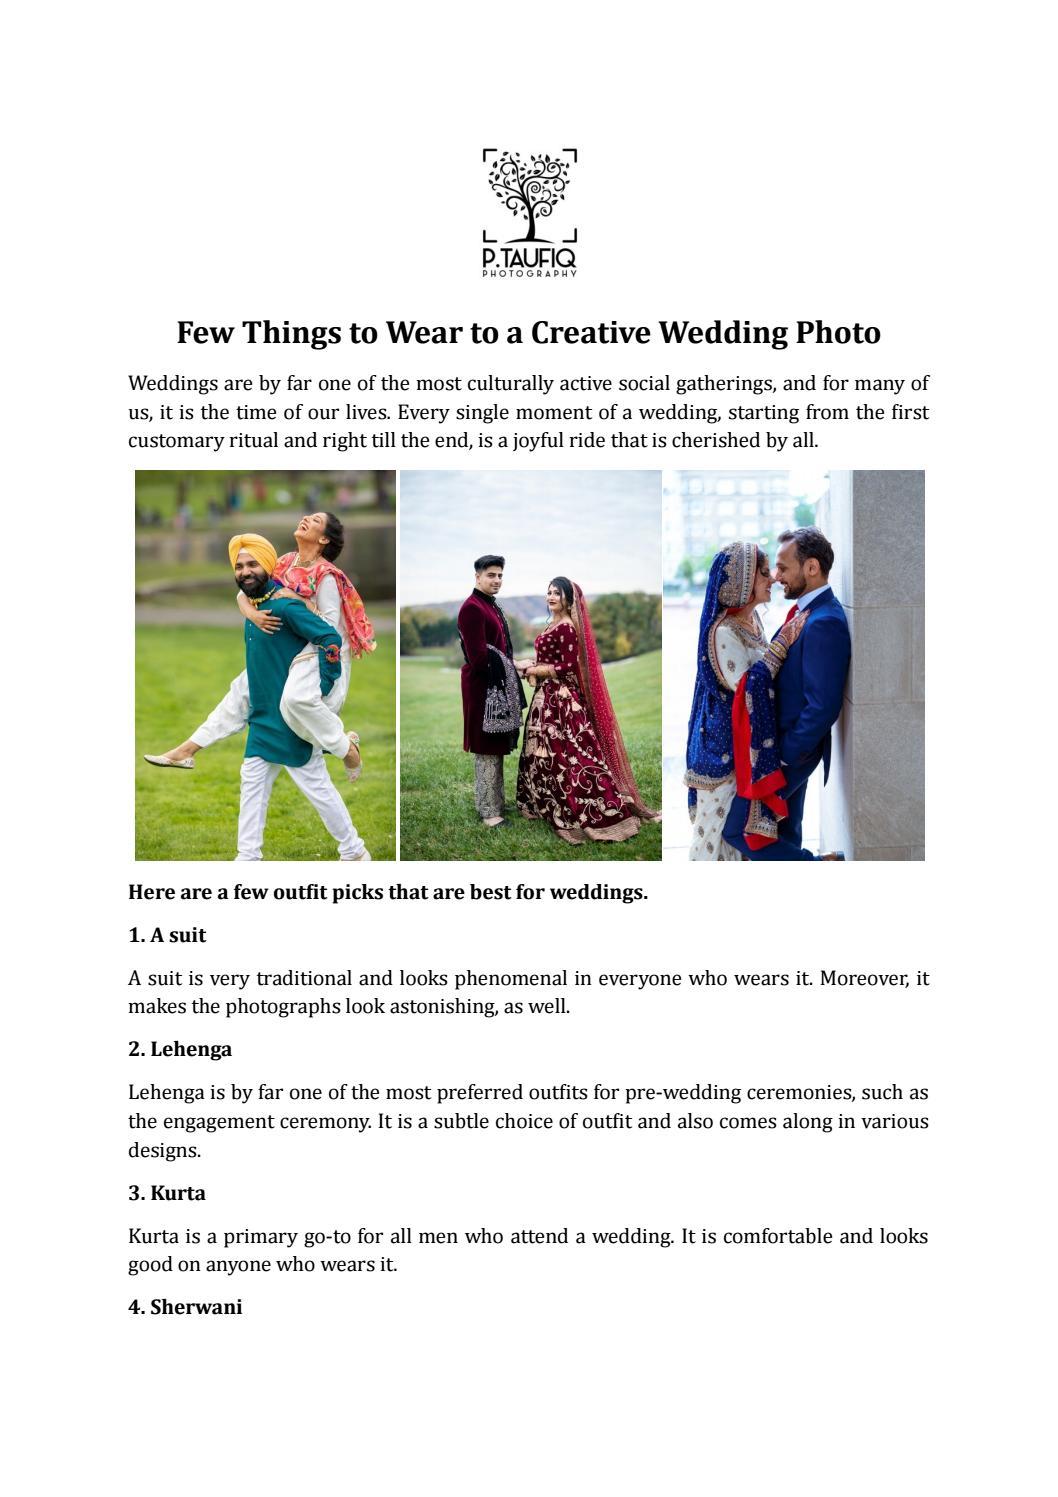 Few Things To Wear To A Creative Wedding Photo By P Taufiq Issuu